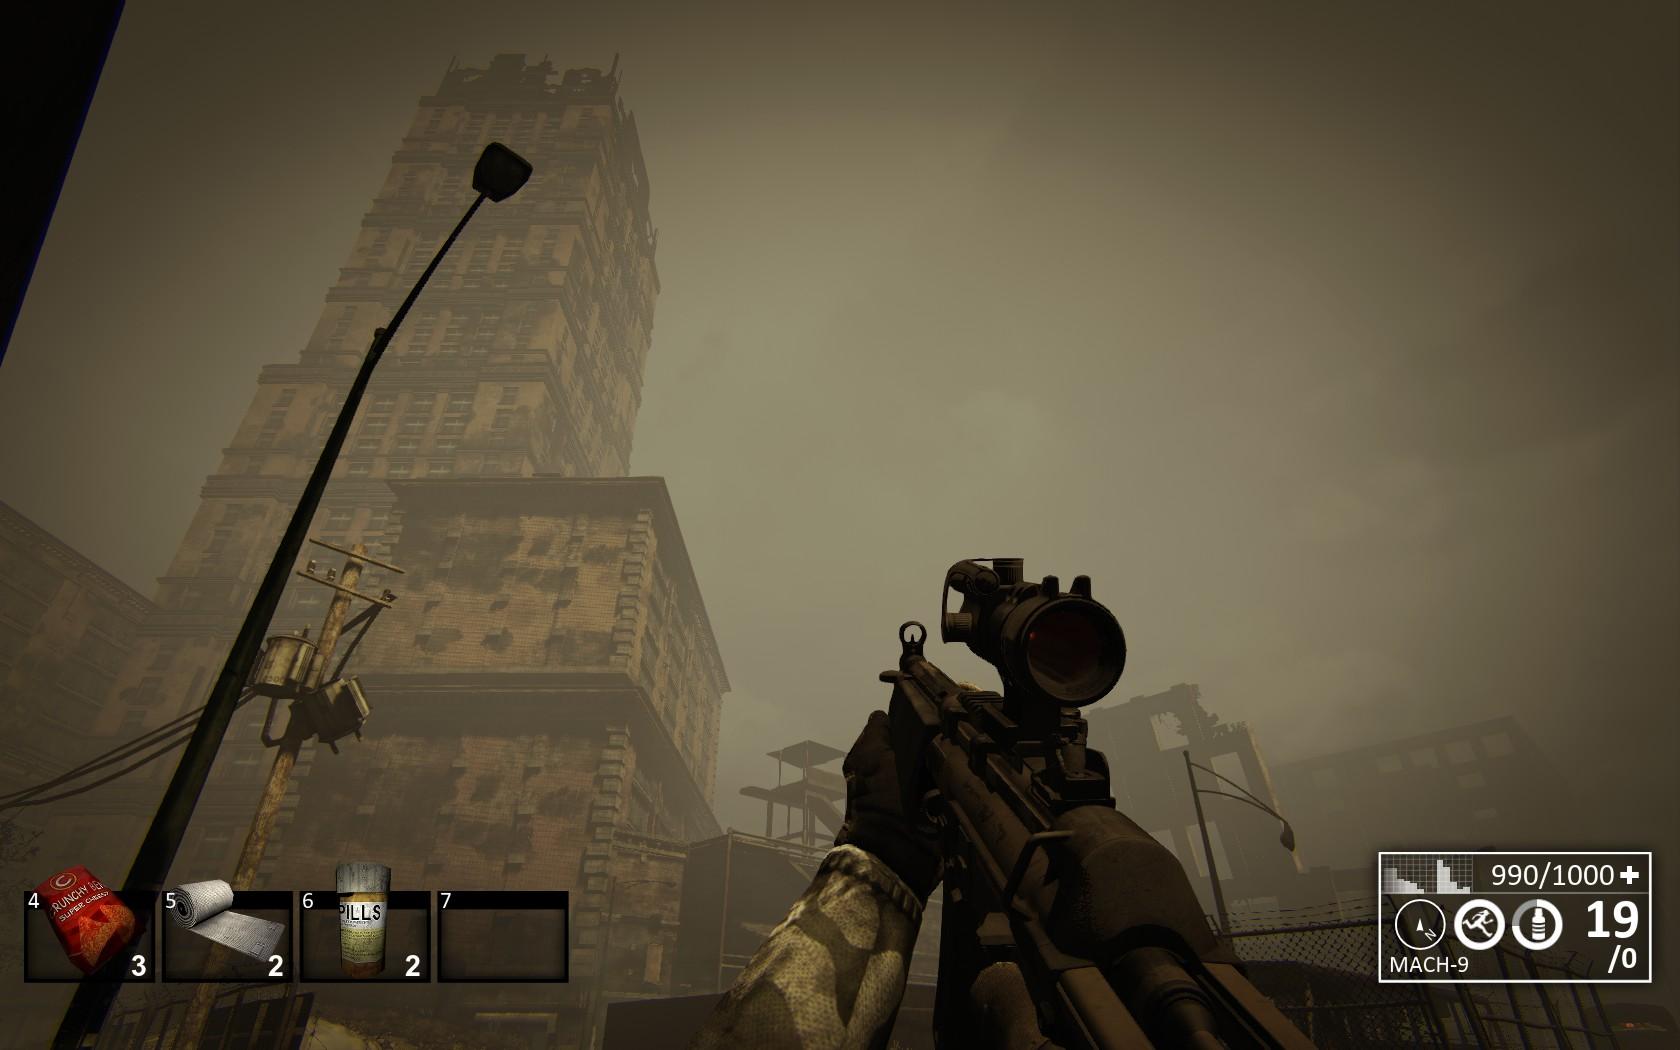 Stalker Online Опустевший небоскреб